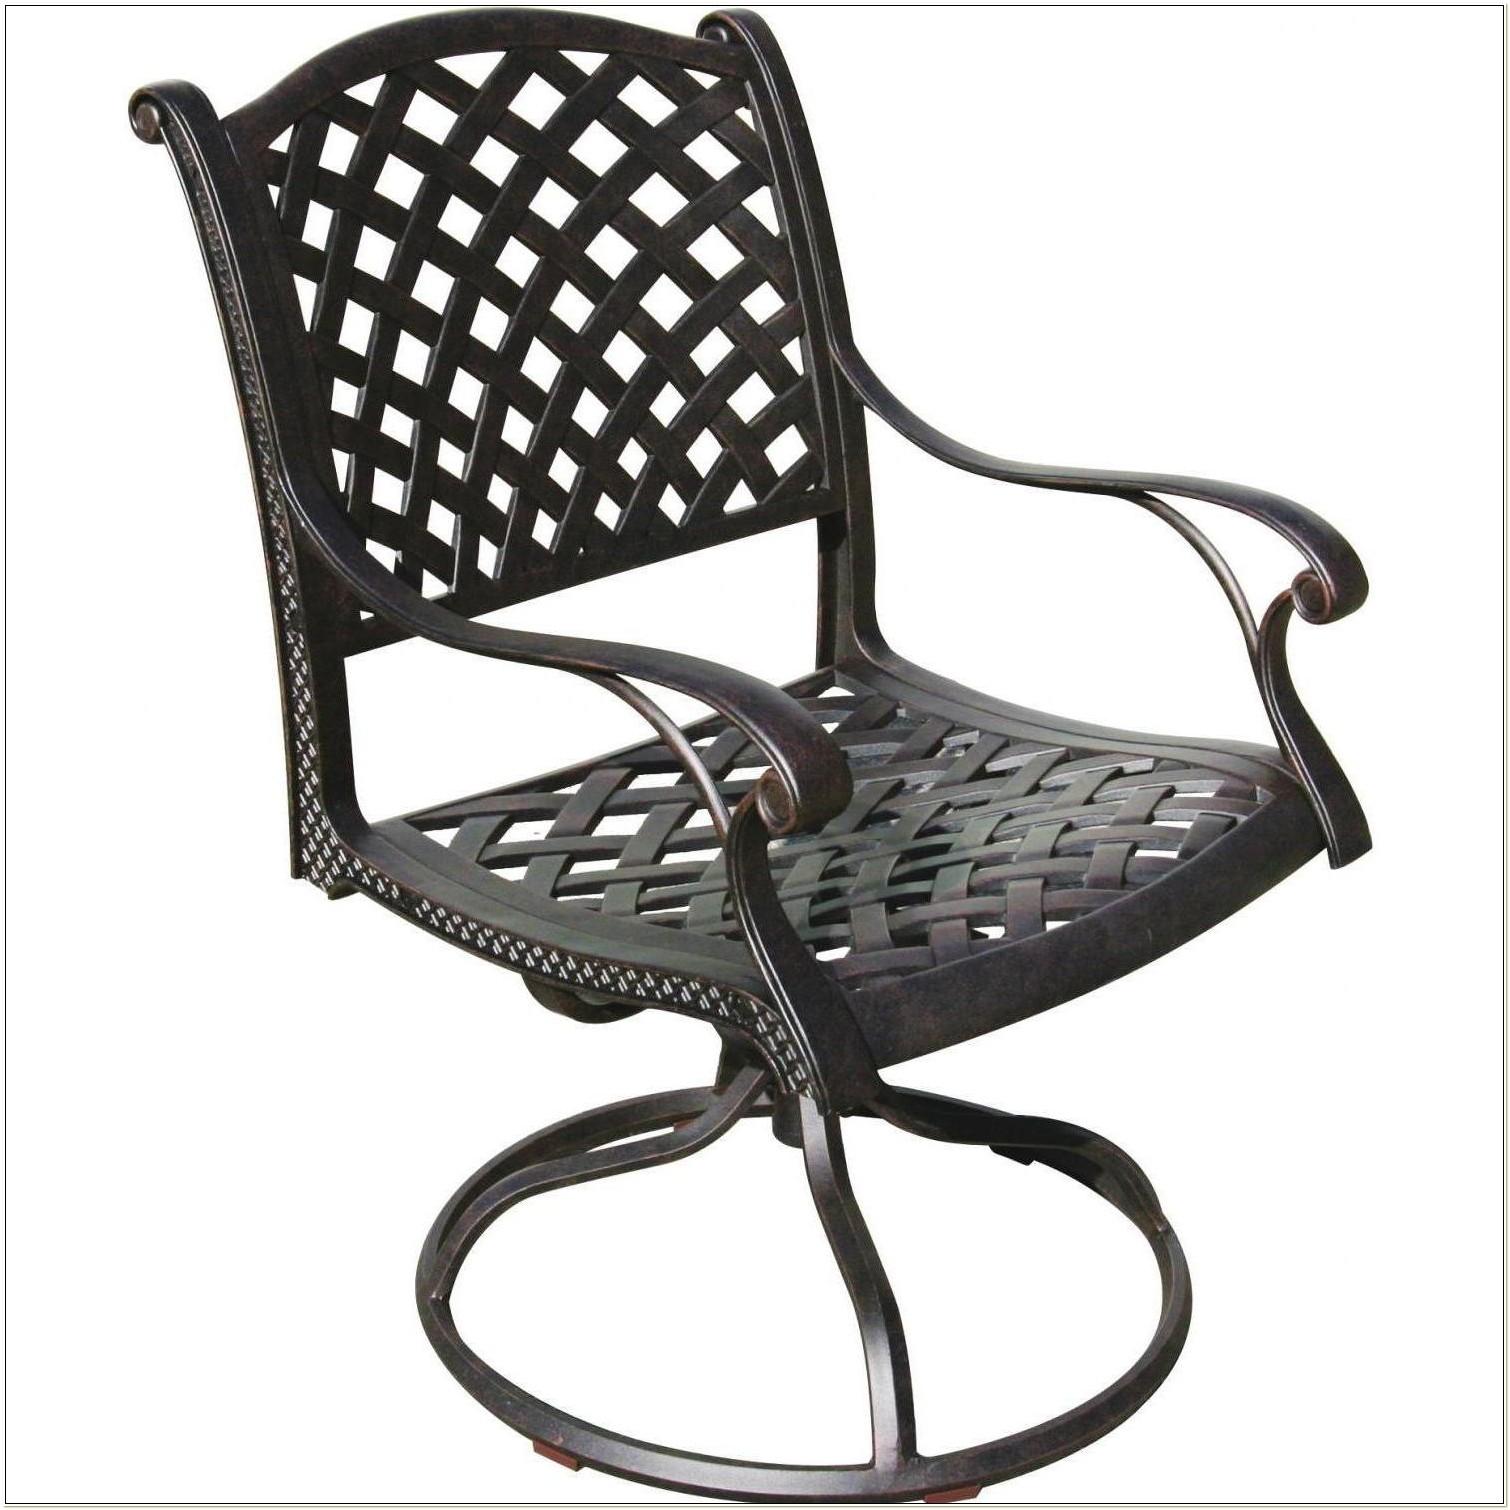 Aluminum Swivel Rocker Patio Dining Chairs